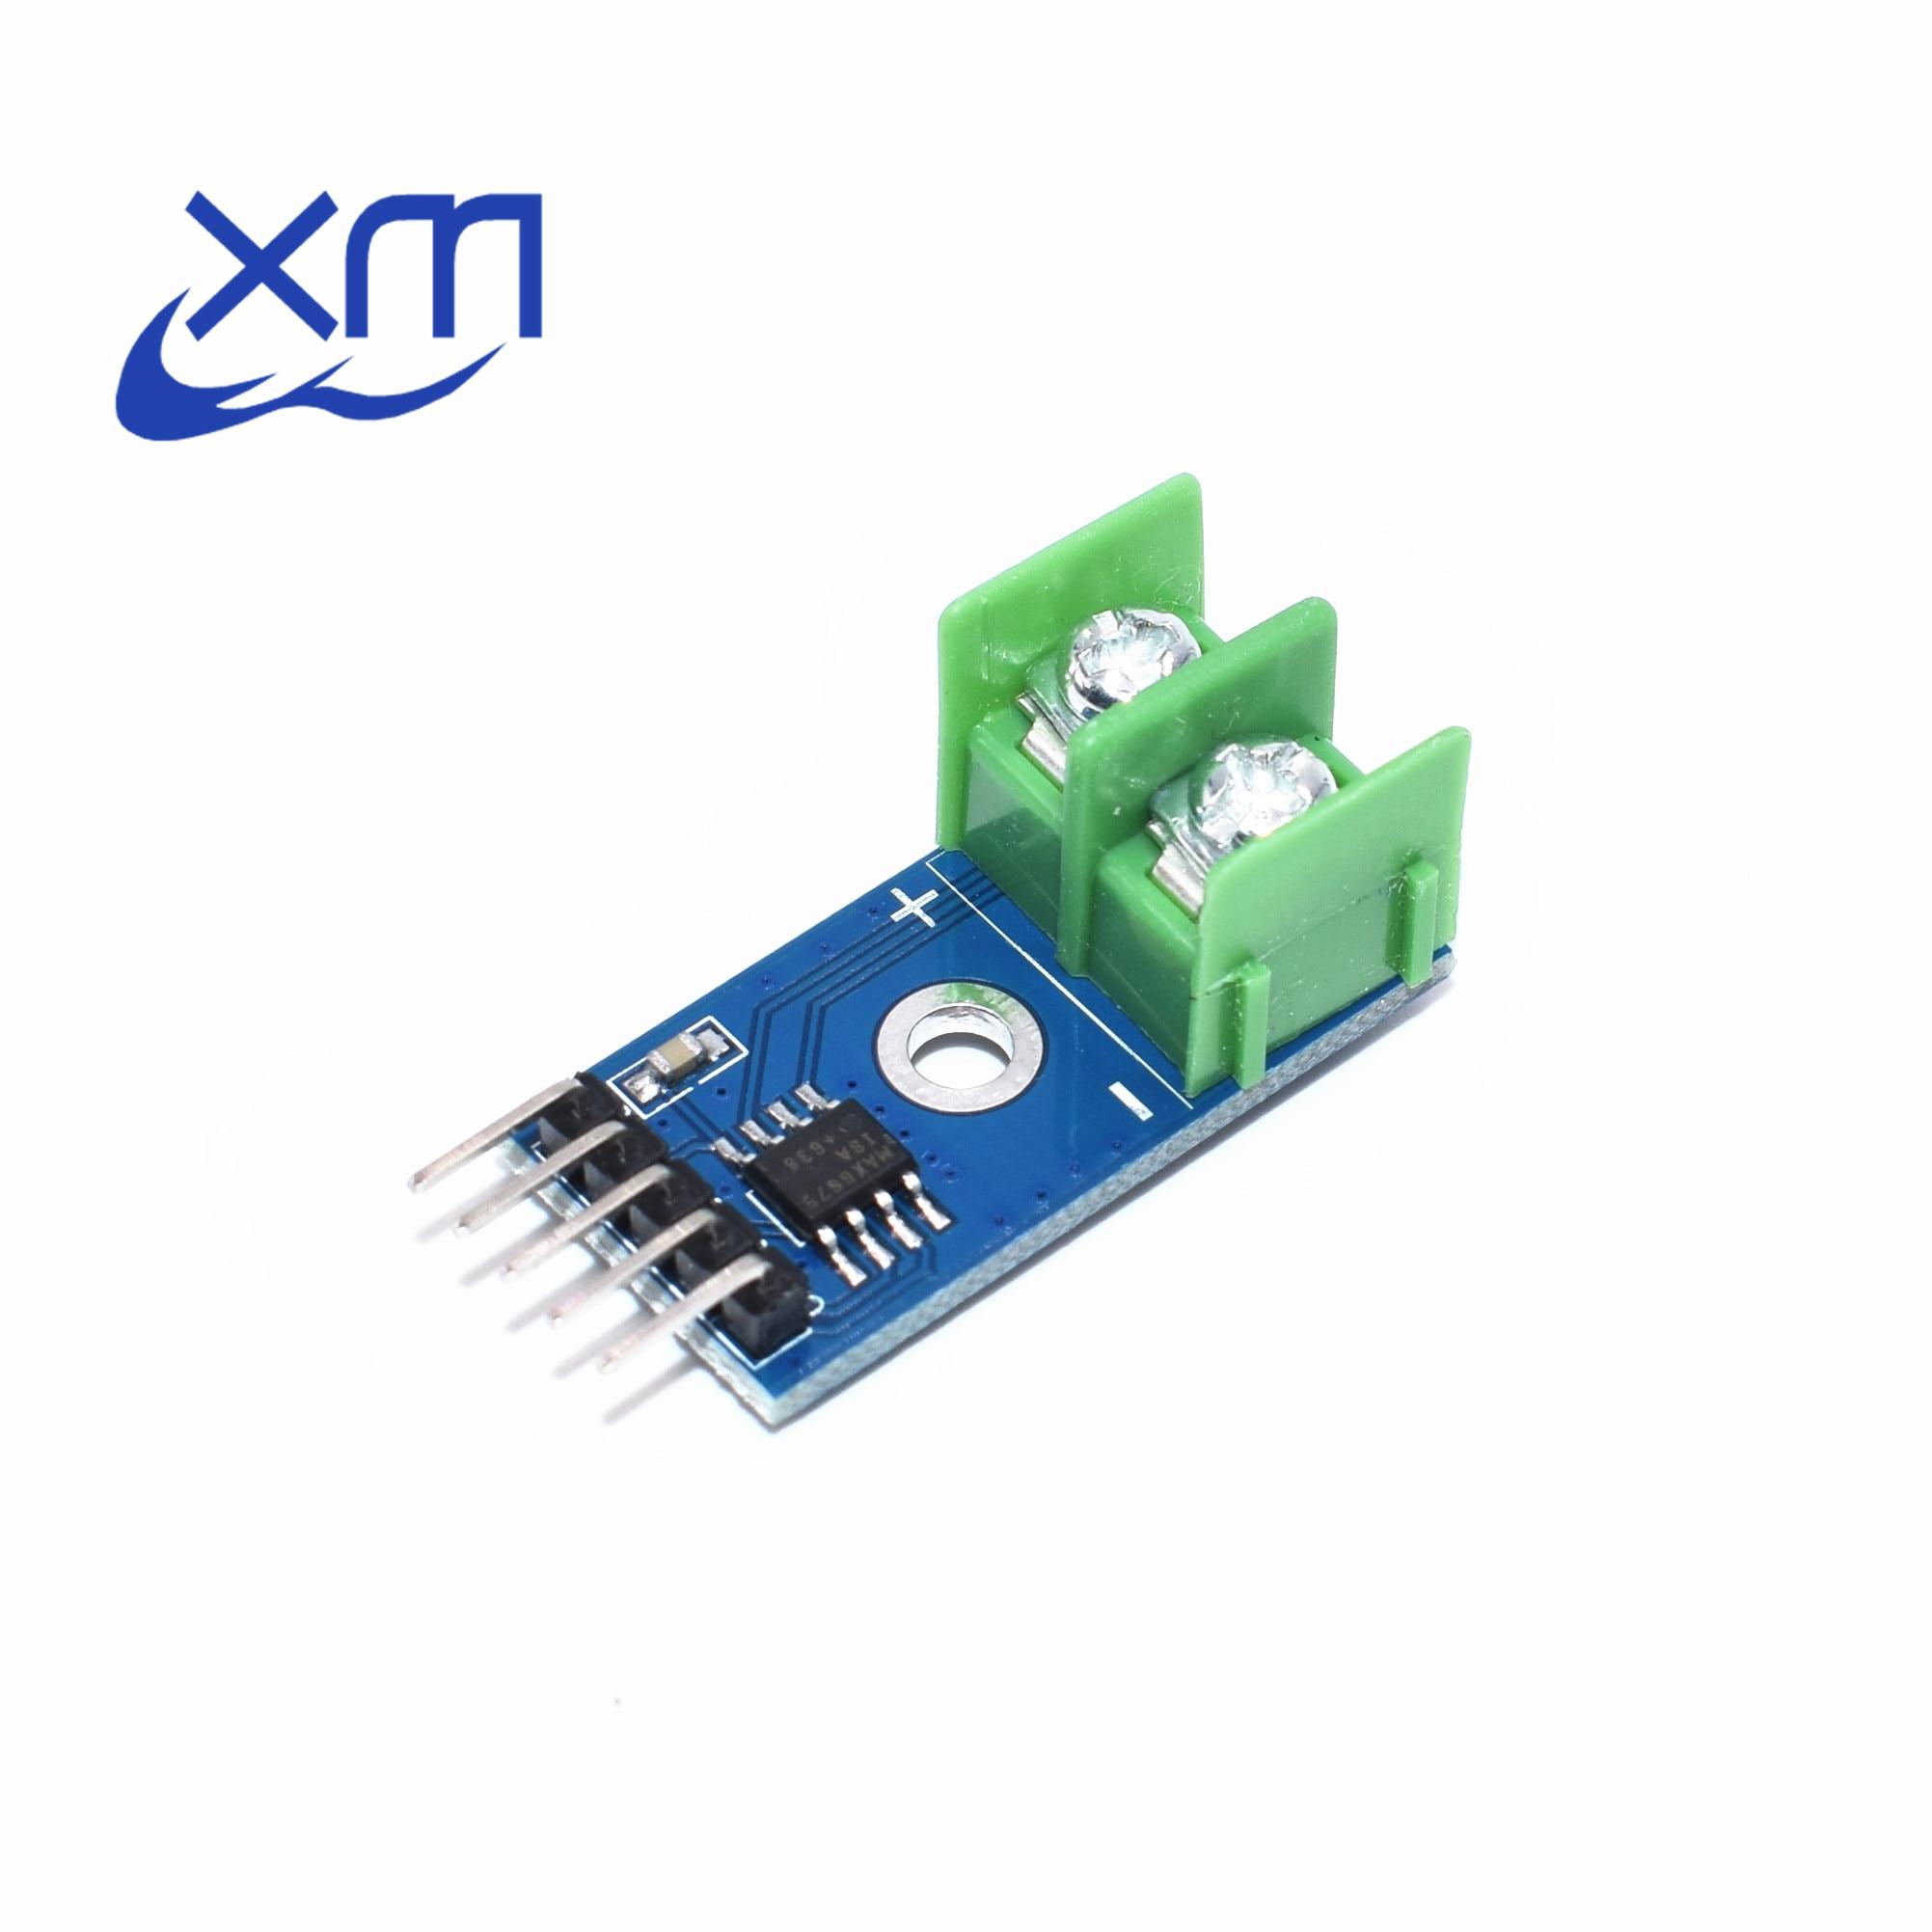 1pcs  MAX6675 K-type Thermocouple Temperature Sensor Temperature 0-800 Degrees Module For Arduino  I45